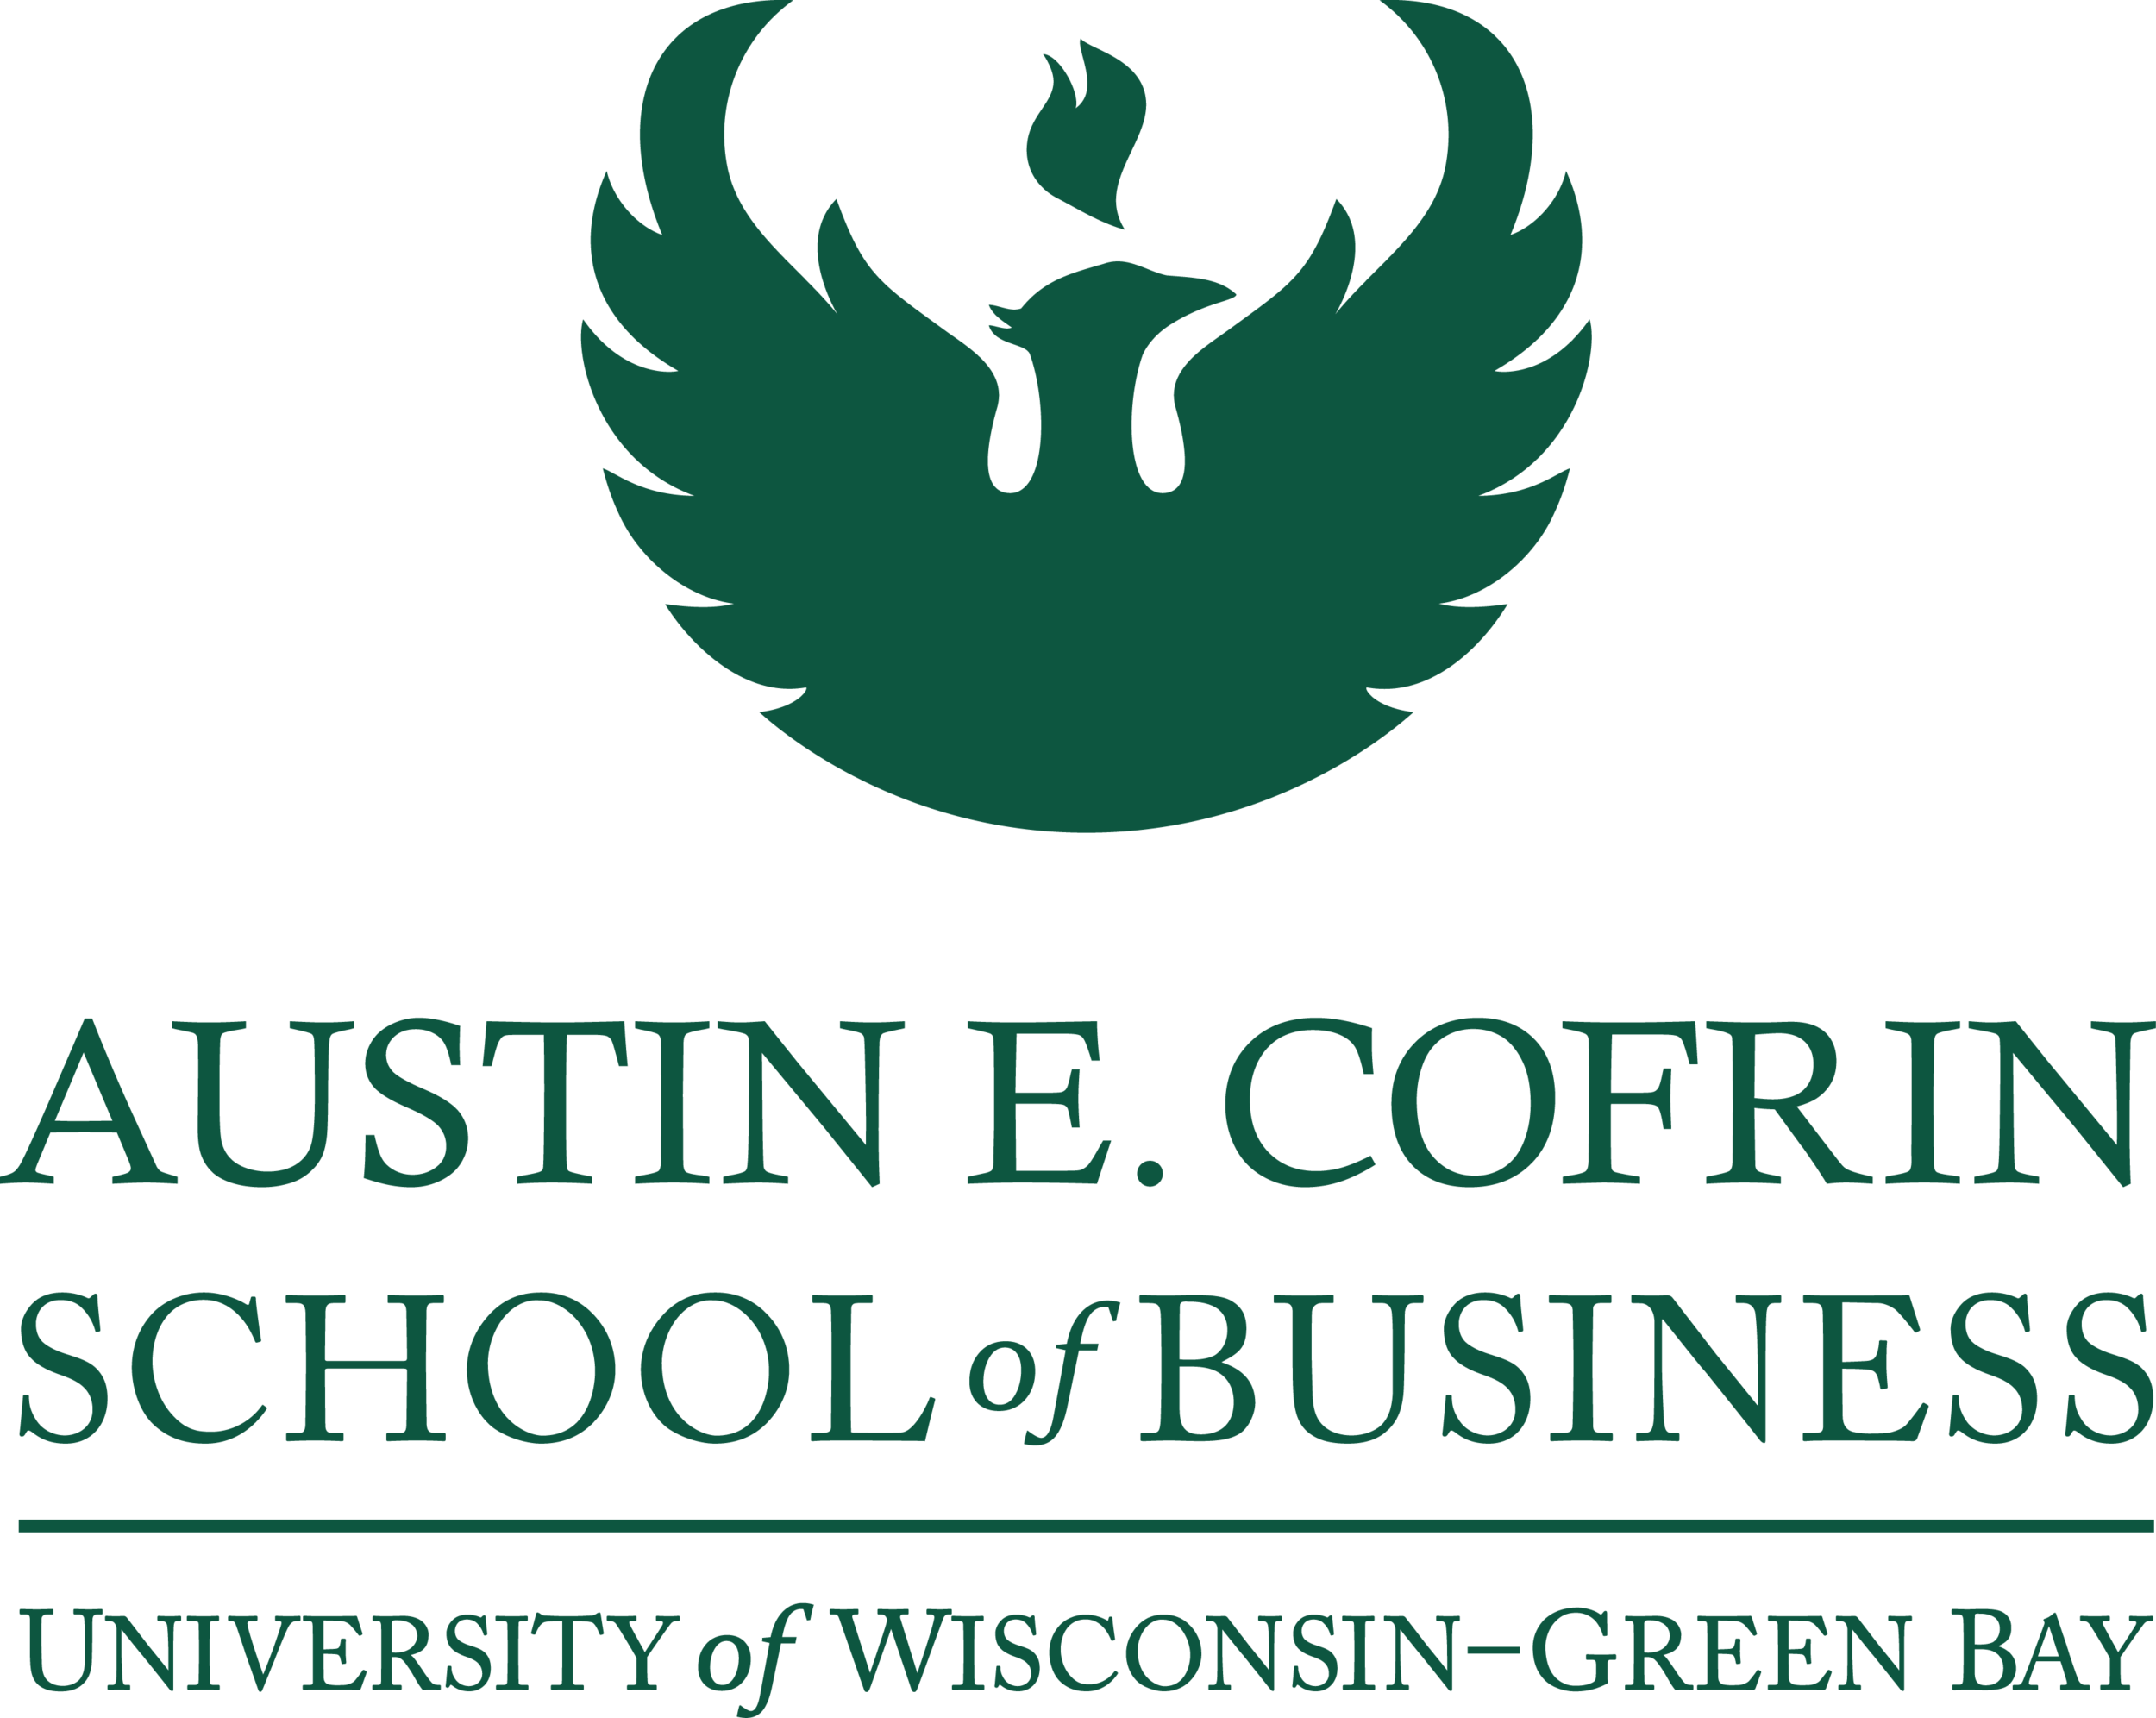 Austin E. Cofrin School of Business-Vertical_Green.png